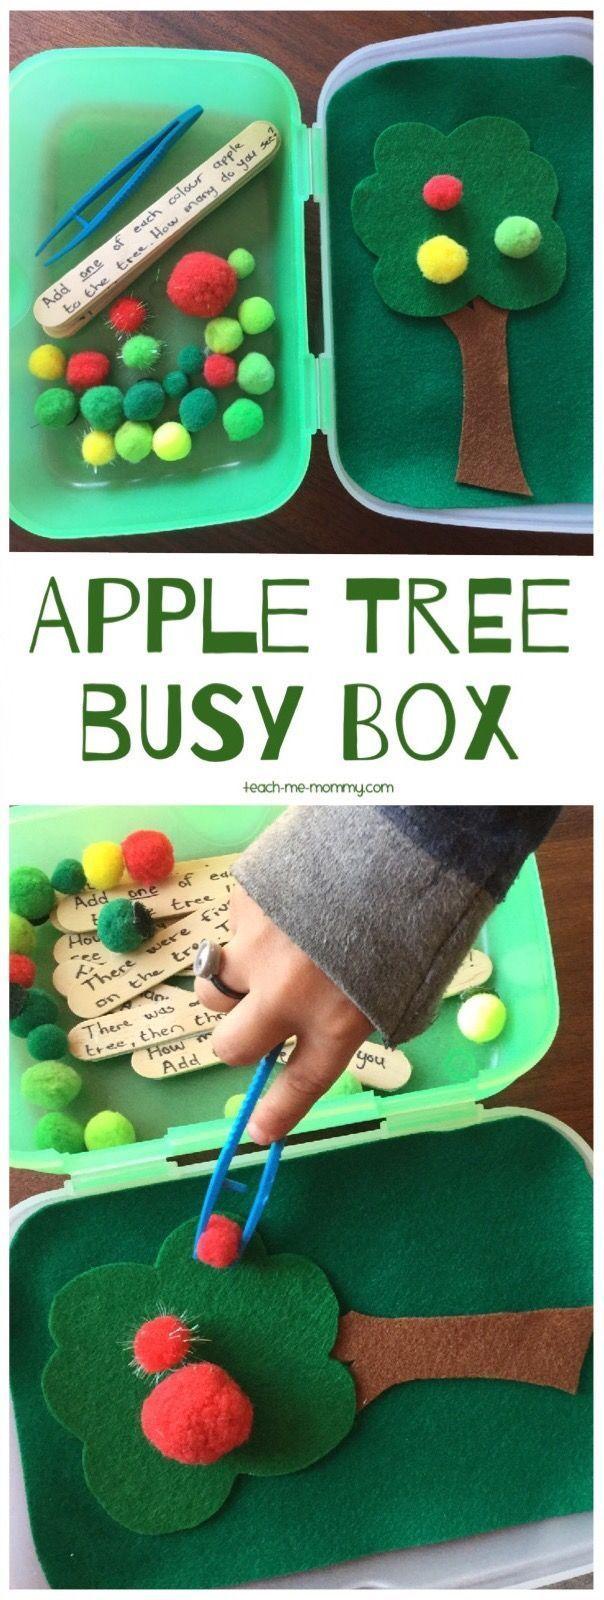 Apple Tree Busy Box